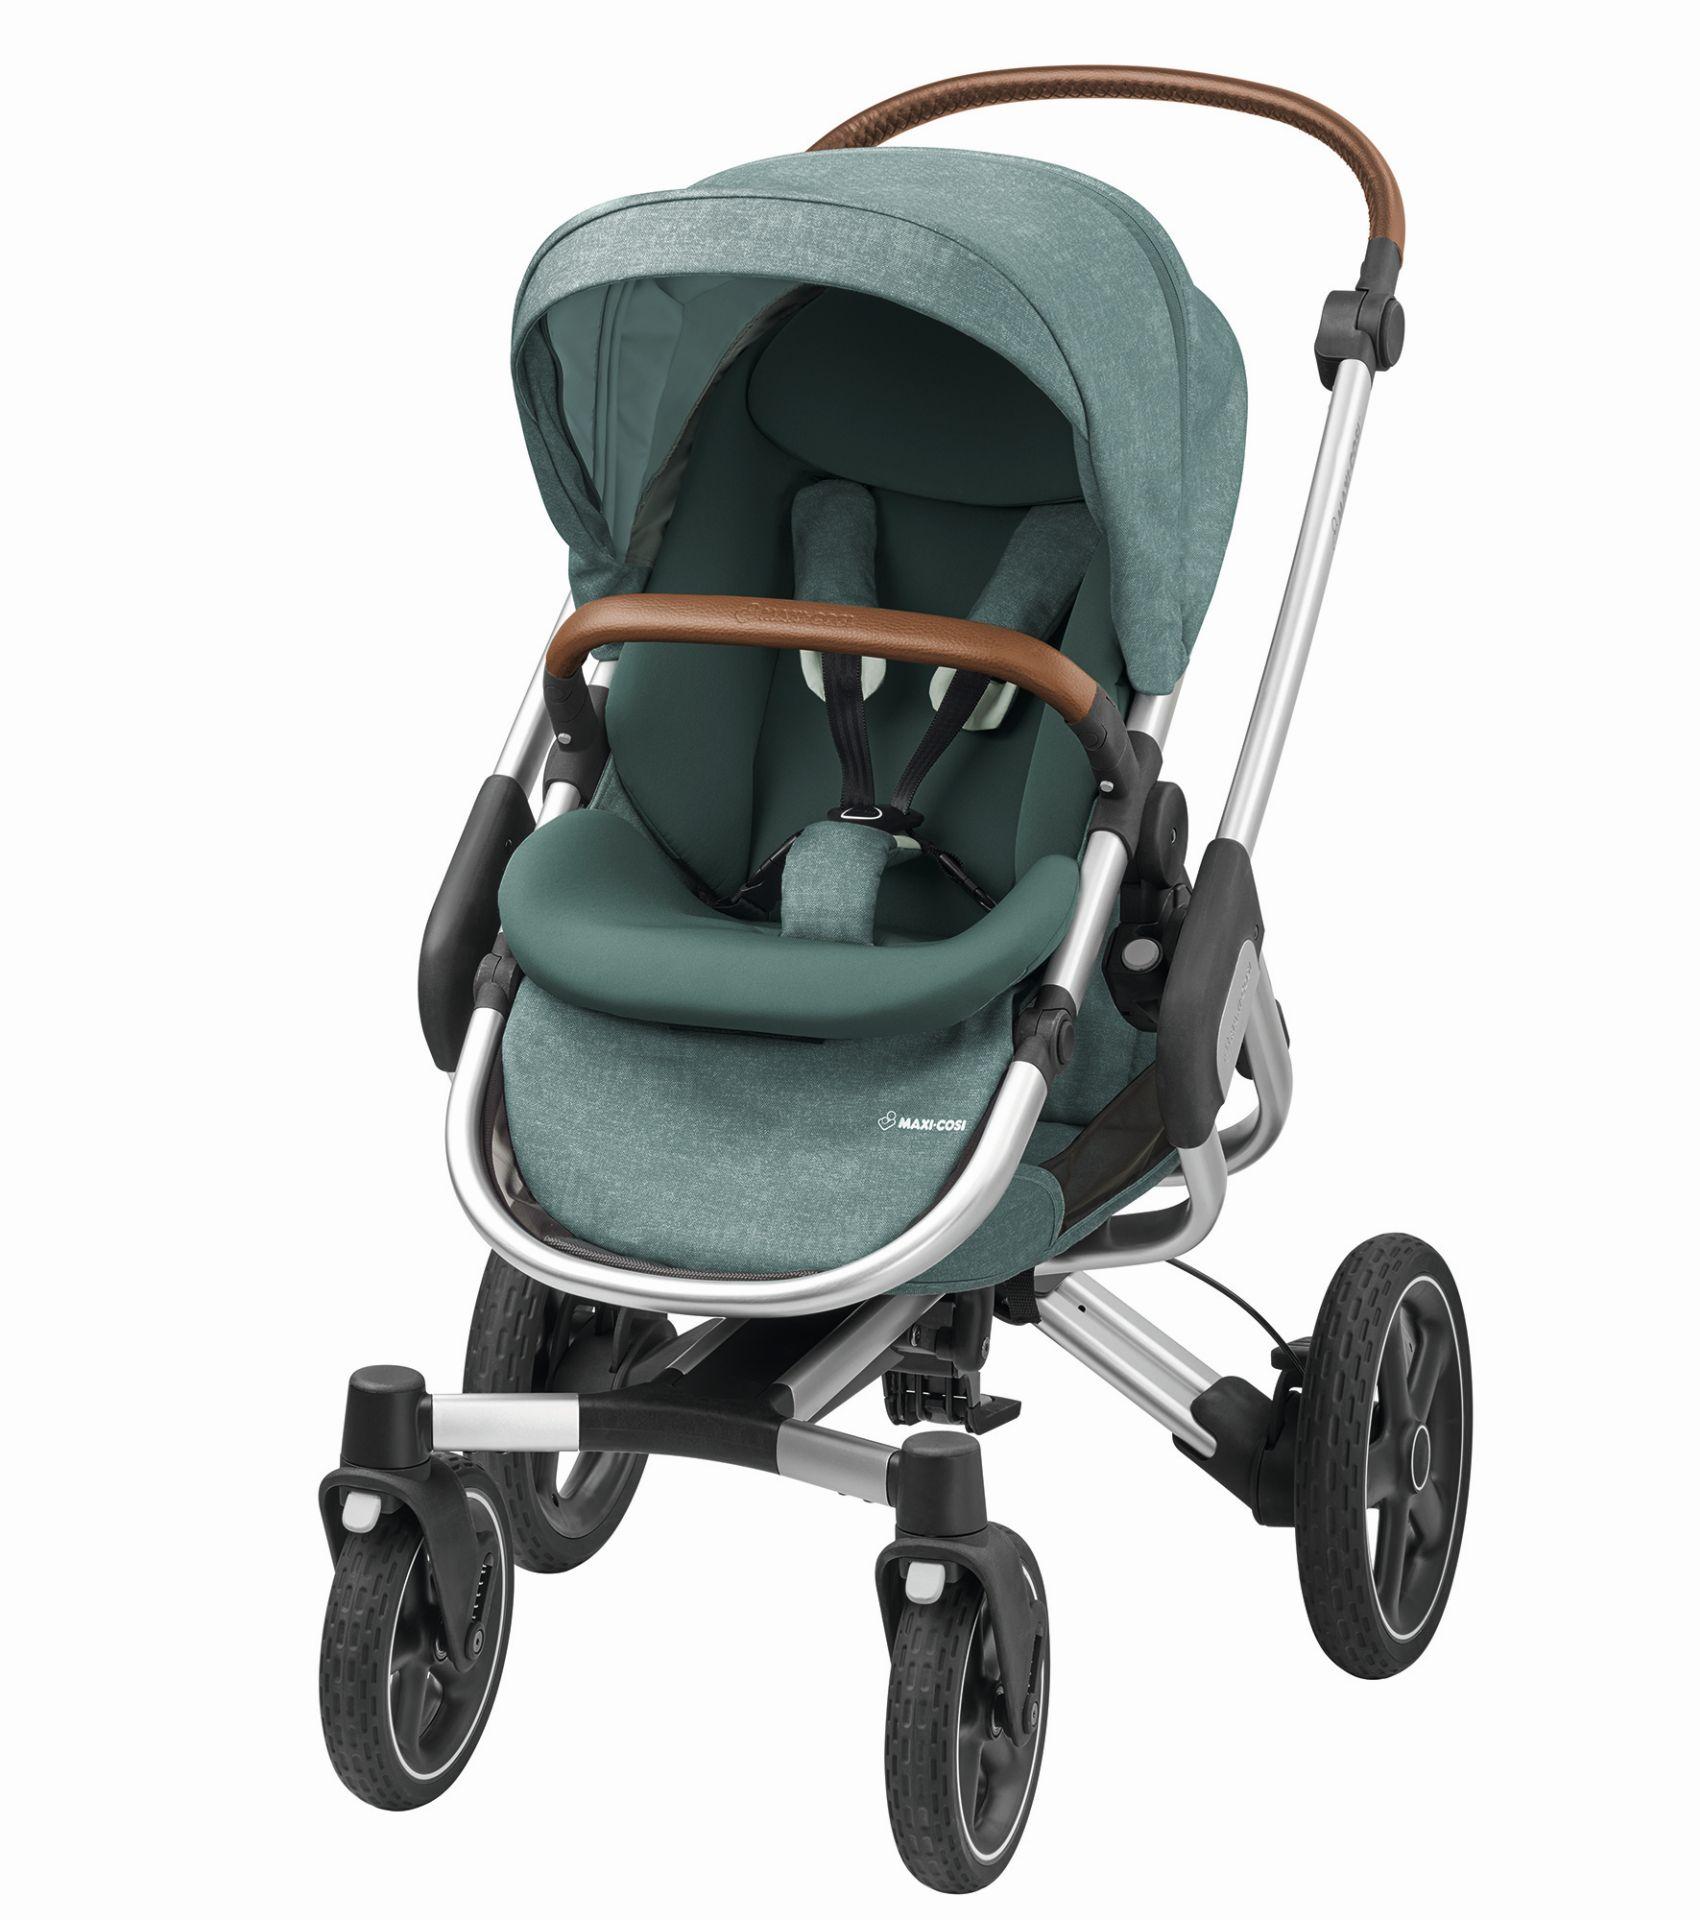 maxi cosi kinderwagen nova 4 rad 2017 nomad green online kaufen bei kidsroom kinderwagen. Black Bedroom Furniture Sets. Home Design Ideas